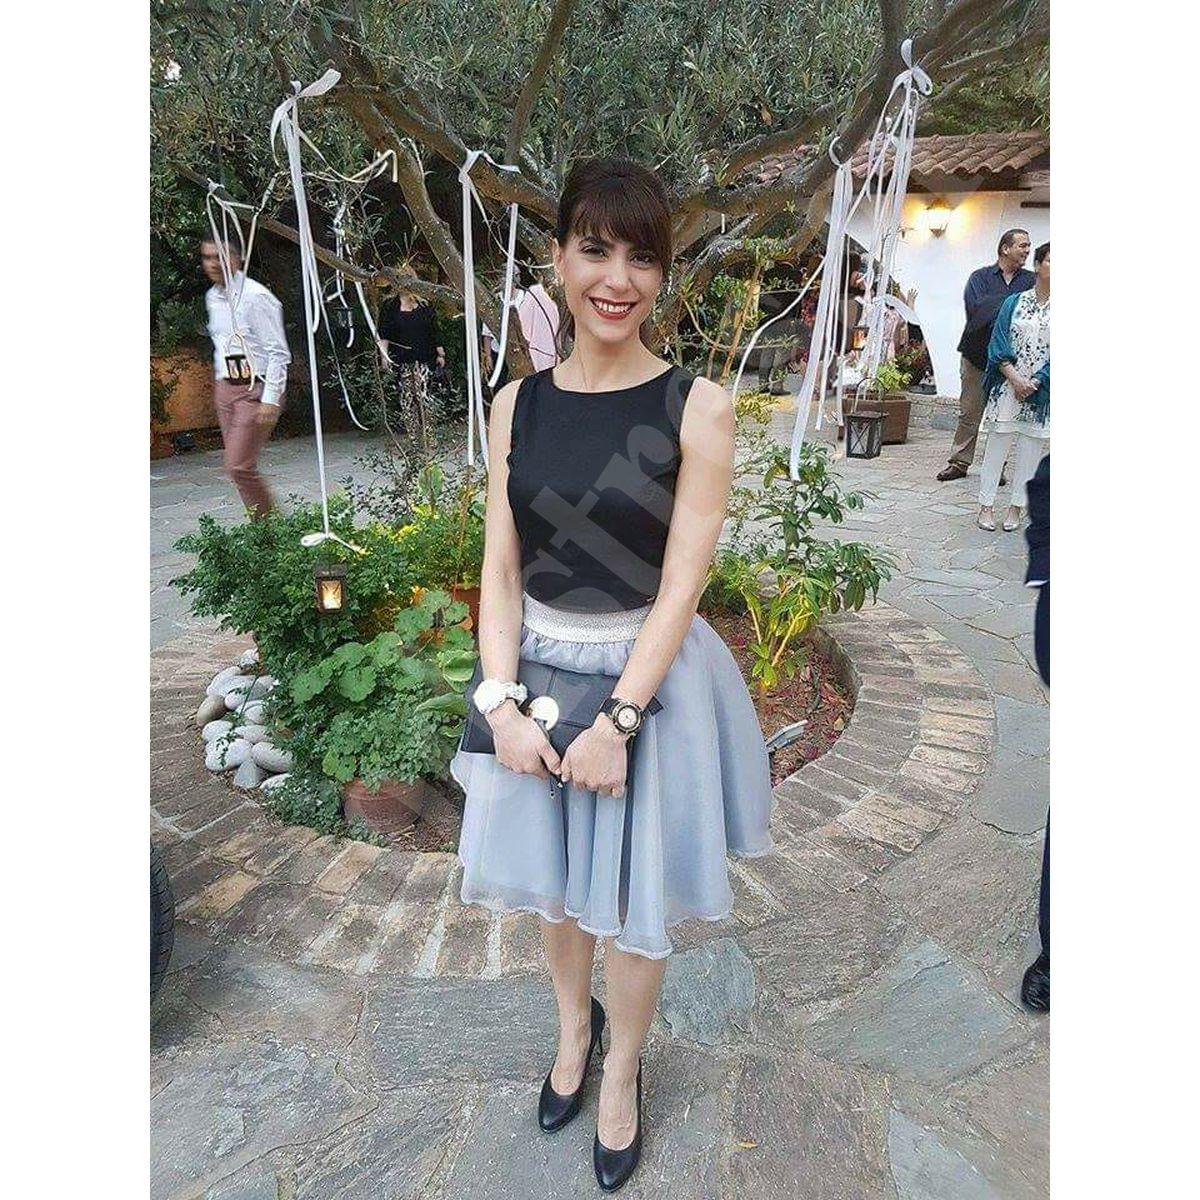 59691fec62cb Τούλινη φούστα με οργάντζα – MODISTRES.COM